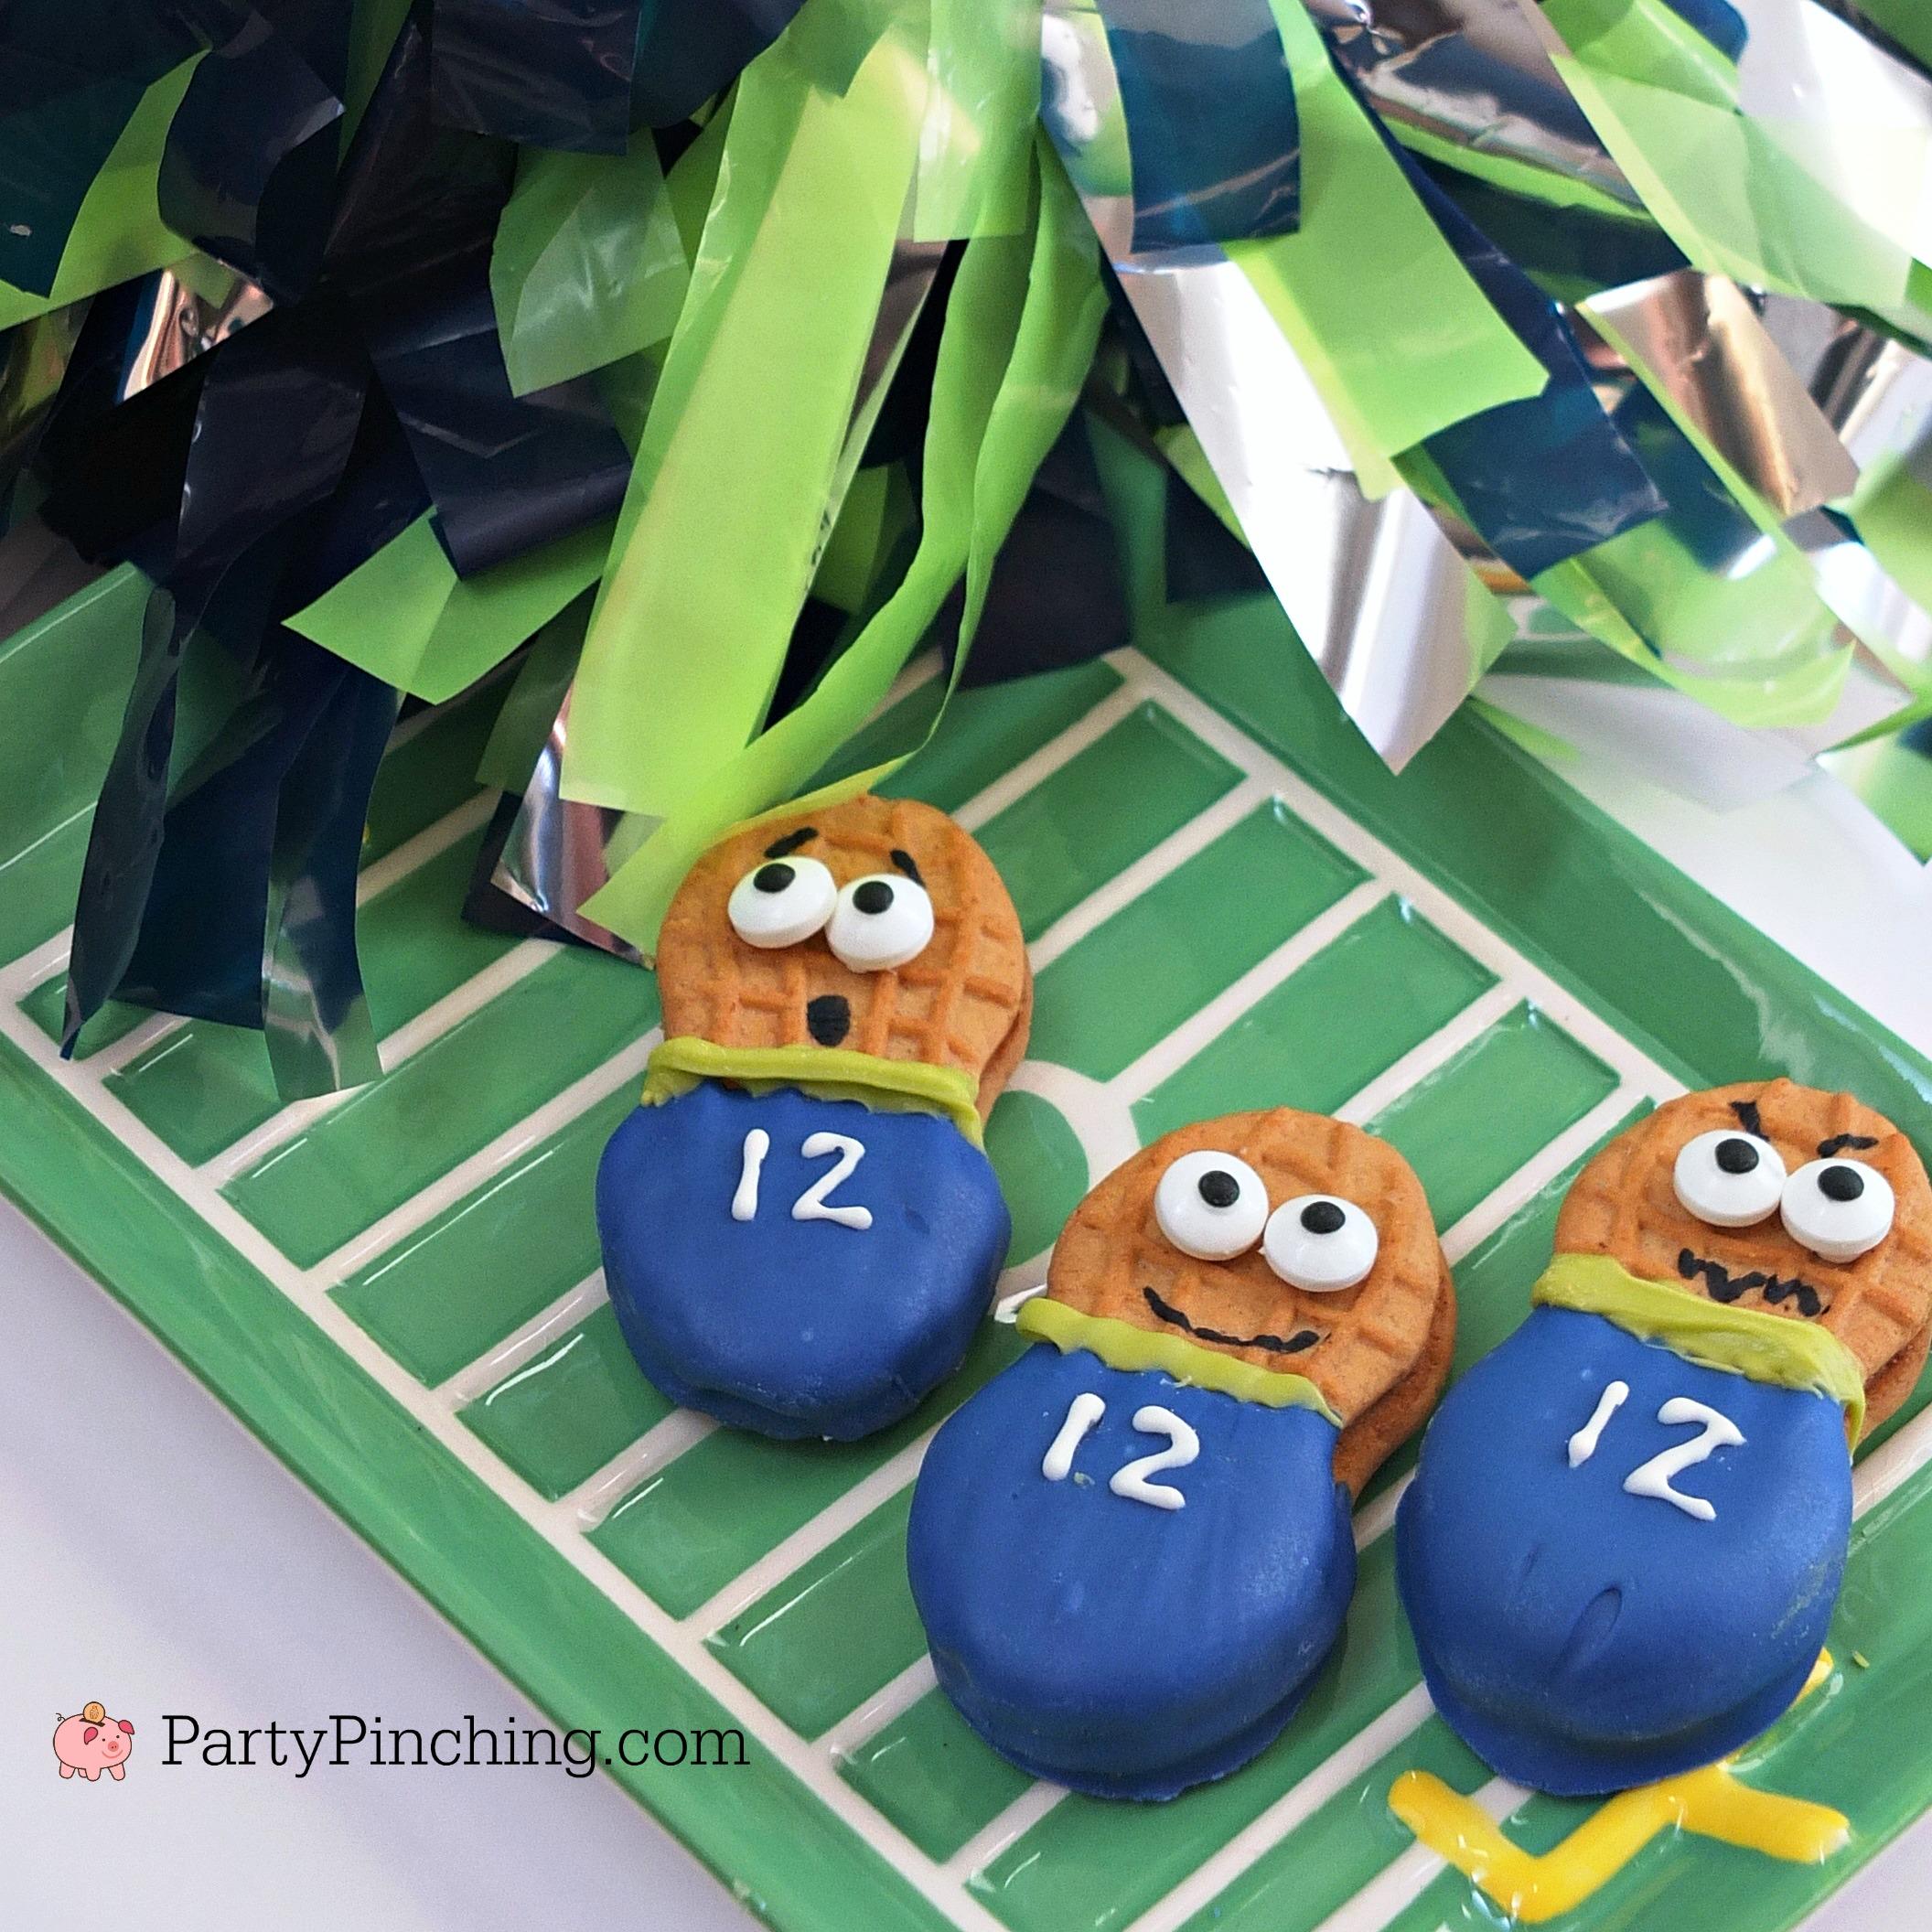 super bowl food, Seattle Seahawks cookies cupcakes, 12th man cupcakes, 12th man Nutter Butter cookies, football cupcakes and cookies